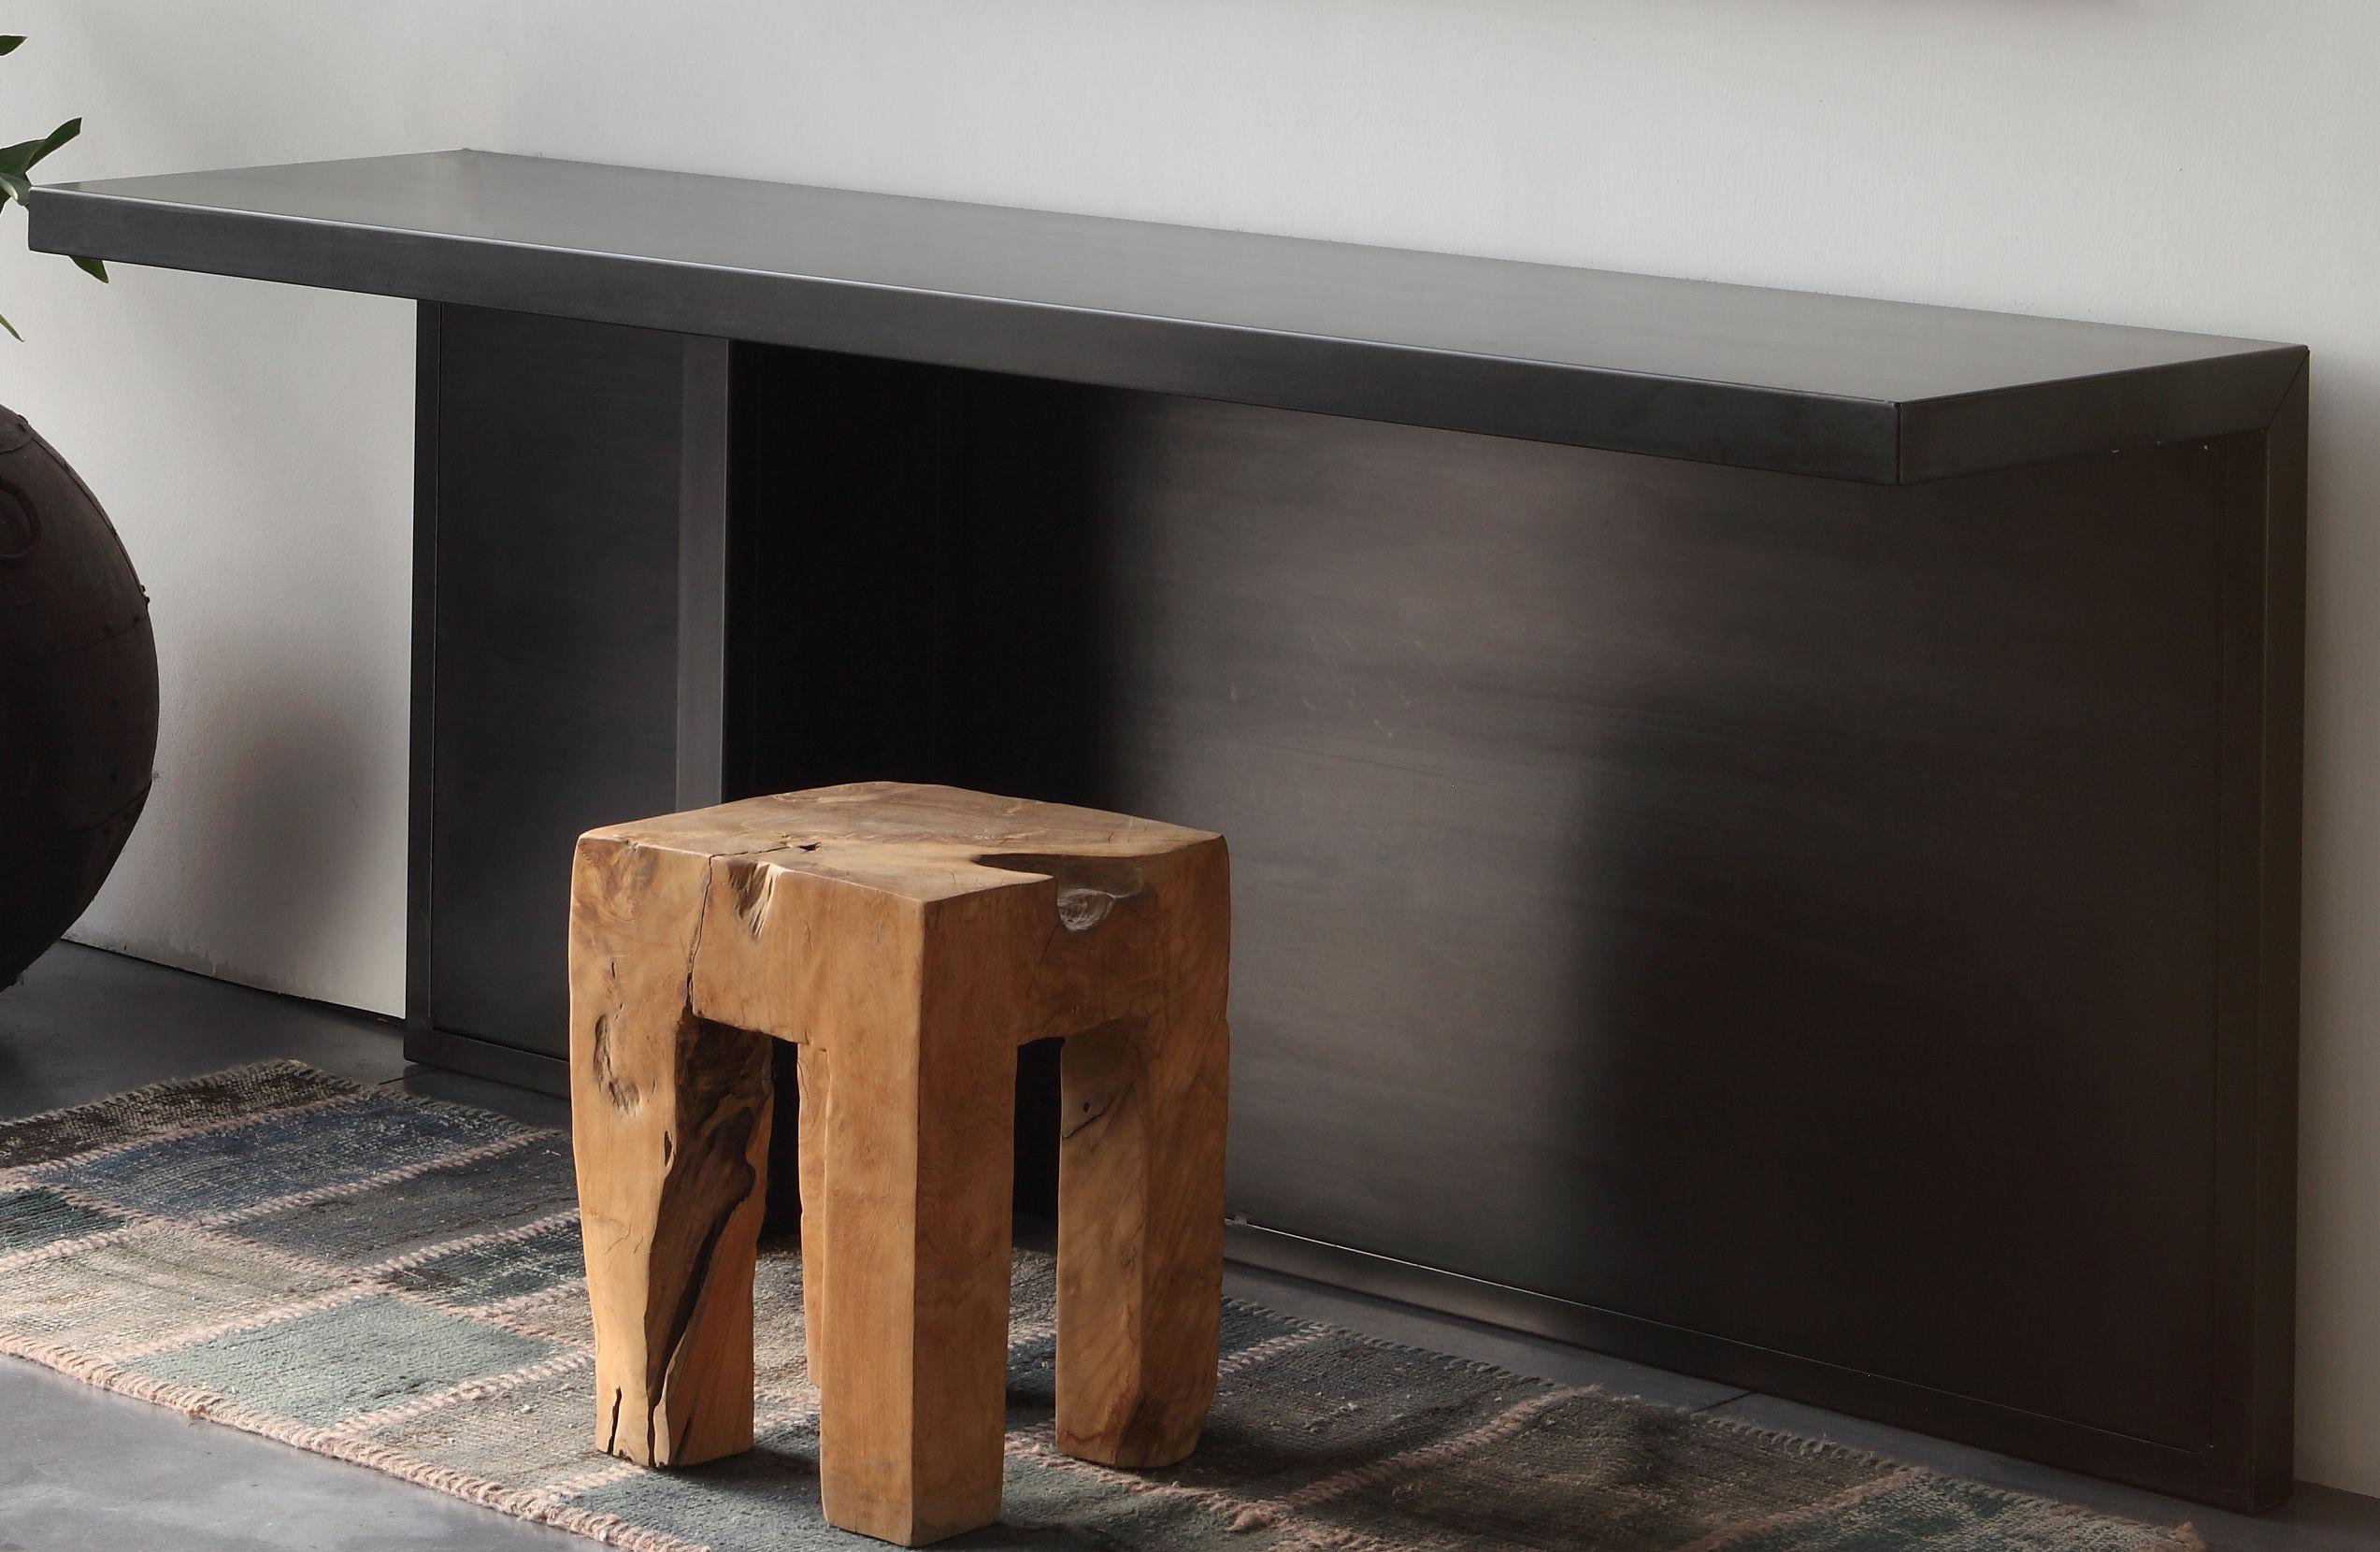 Möbel - Büromöbel - Atrium Konsole / Schreibtisch - L 170 cm x T 45 cm - Zeus - Schwarzmatt, phosphatiert - phosphatierter Stahl